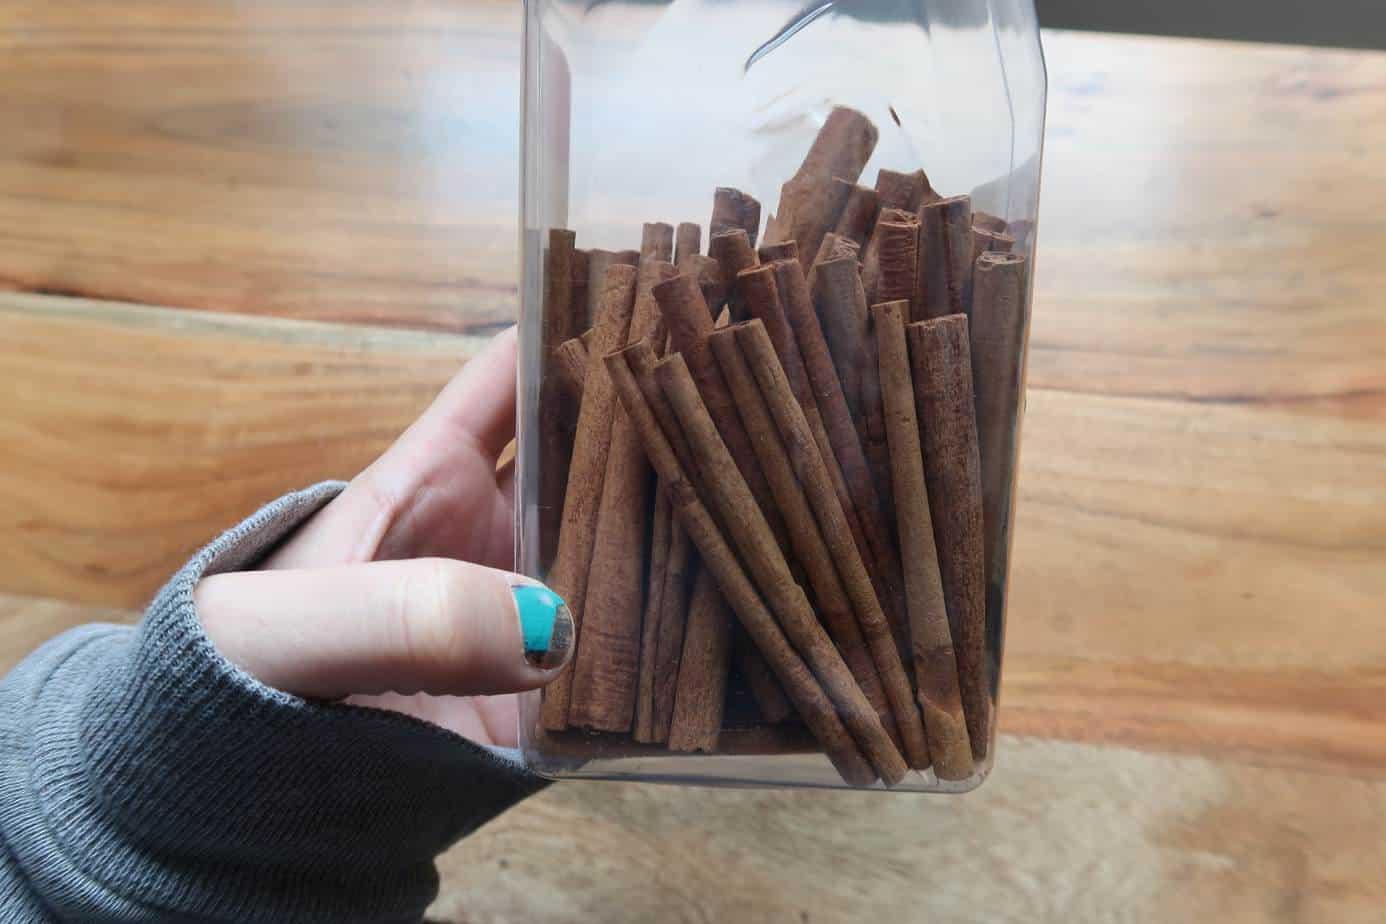 cheap cinnamon sticks at BJs